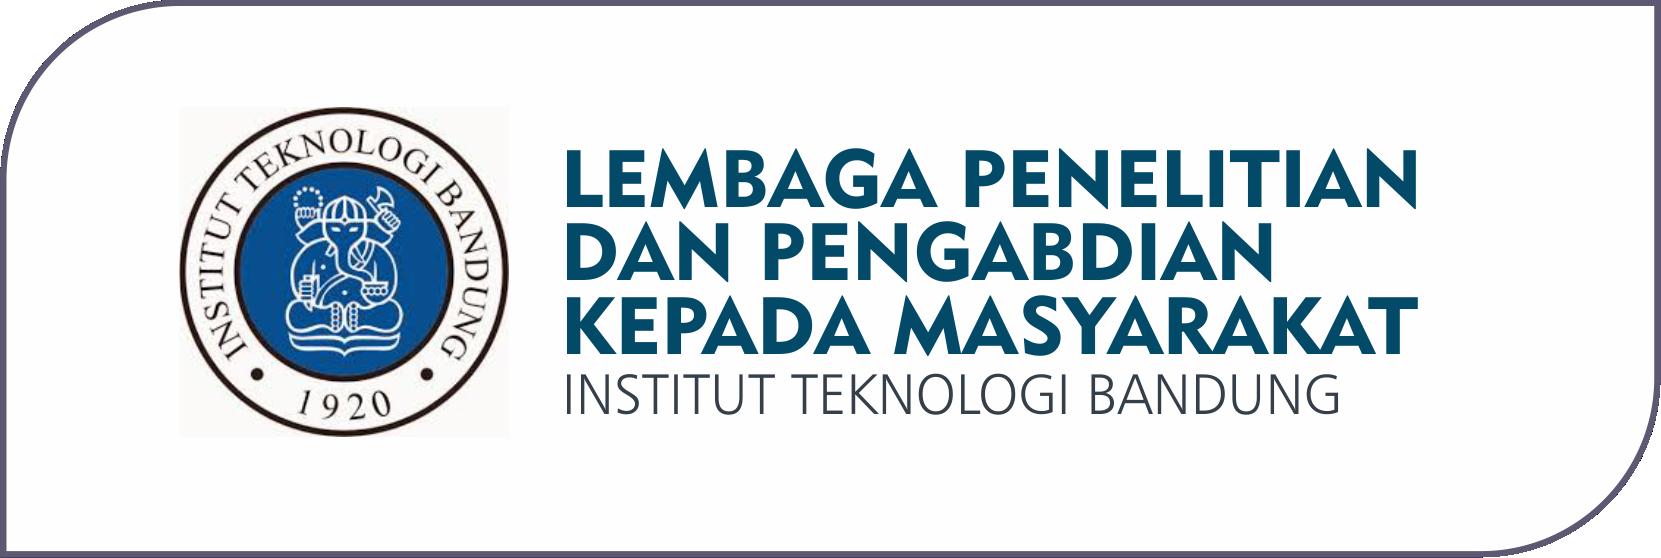 Lembaga Penelitian dan Pengabdian kepada Masyarakat - Lembaga Penelitian dan Pengabdian kepada Masyarakat